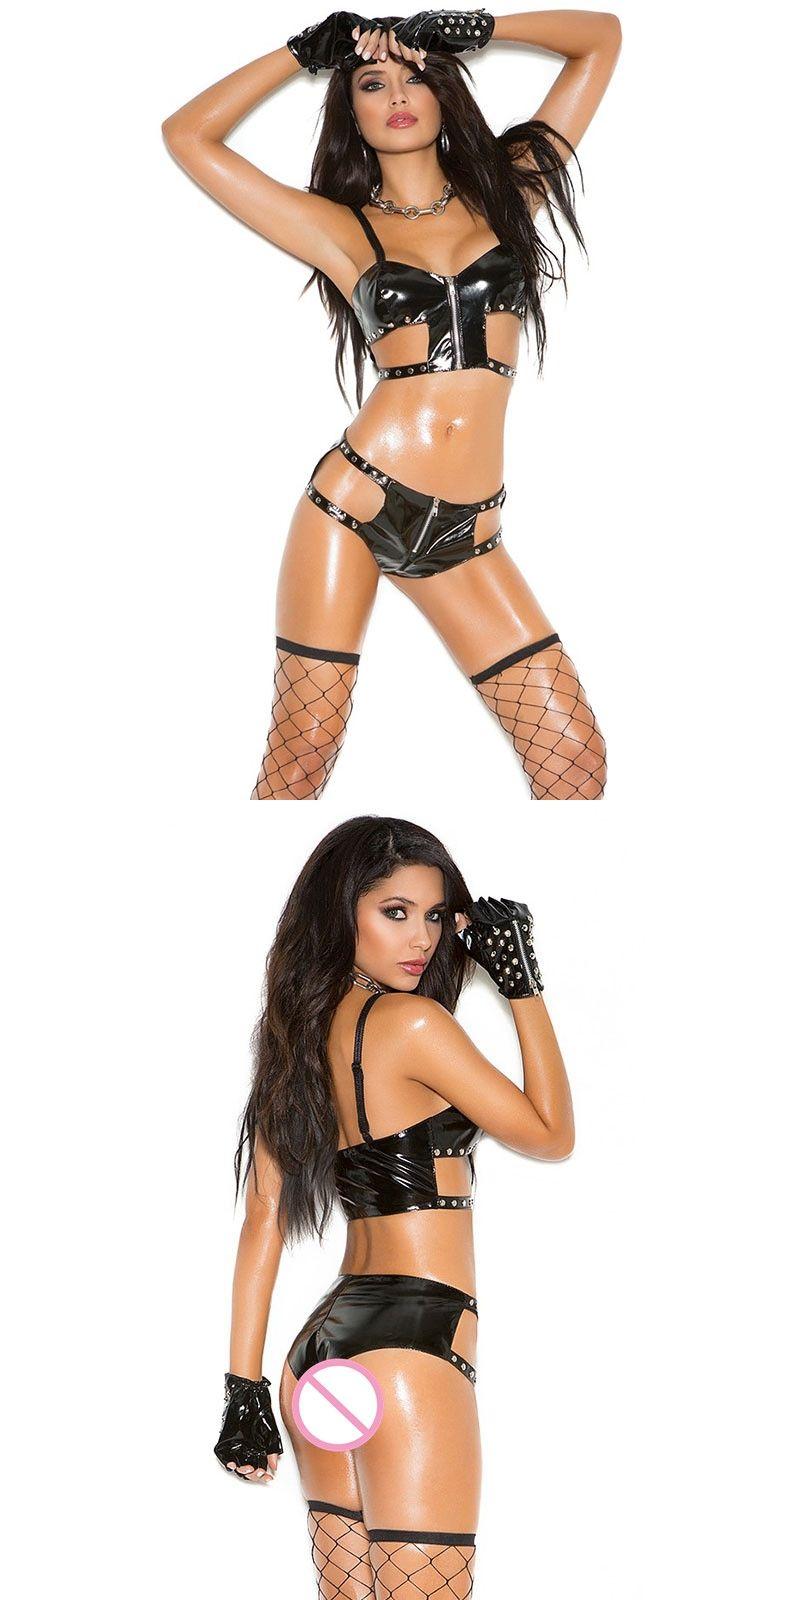 4bf18be051 PVC Leather Fetish Lingerie Set 2017 Wet Look Latex Vinyl Lingerie Sexy Hot  Erotic Rivet Spaghetti Strap Bra Underwear Oversize